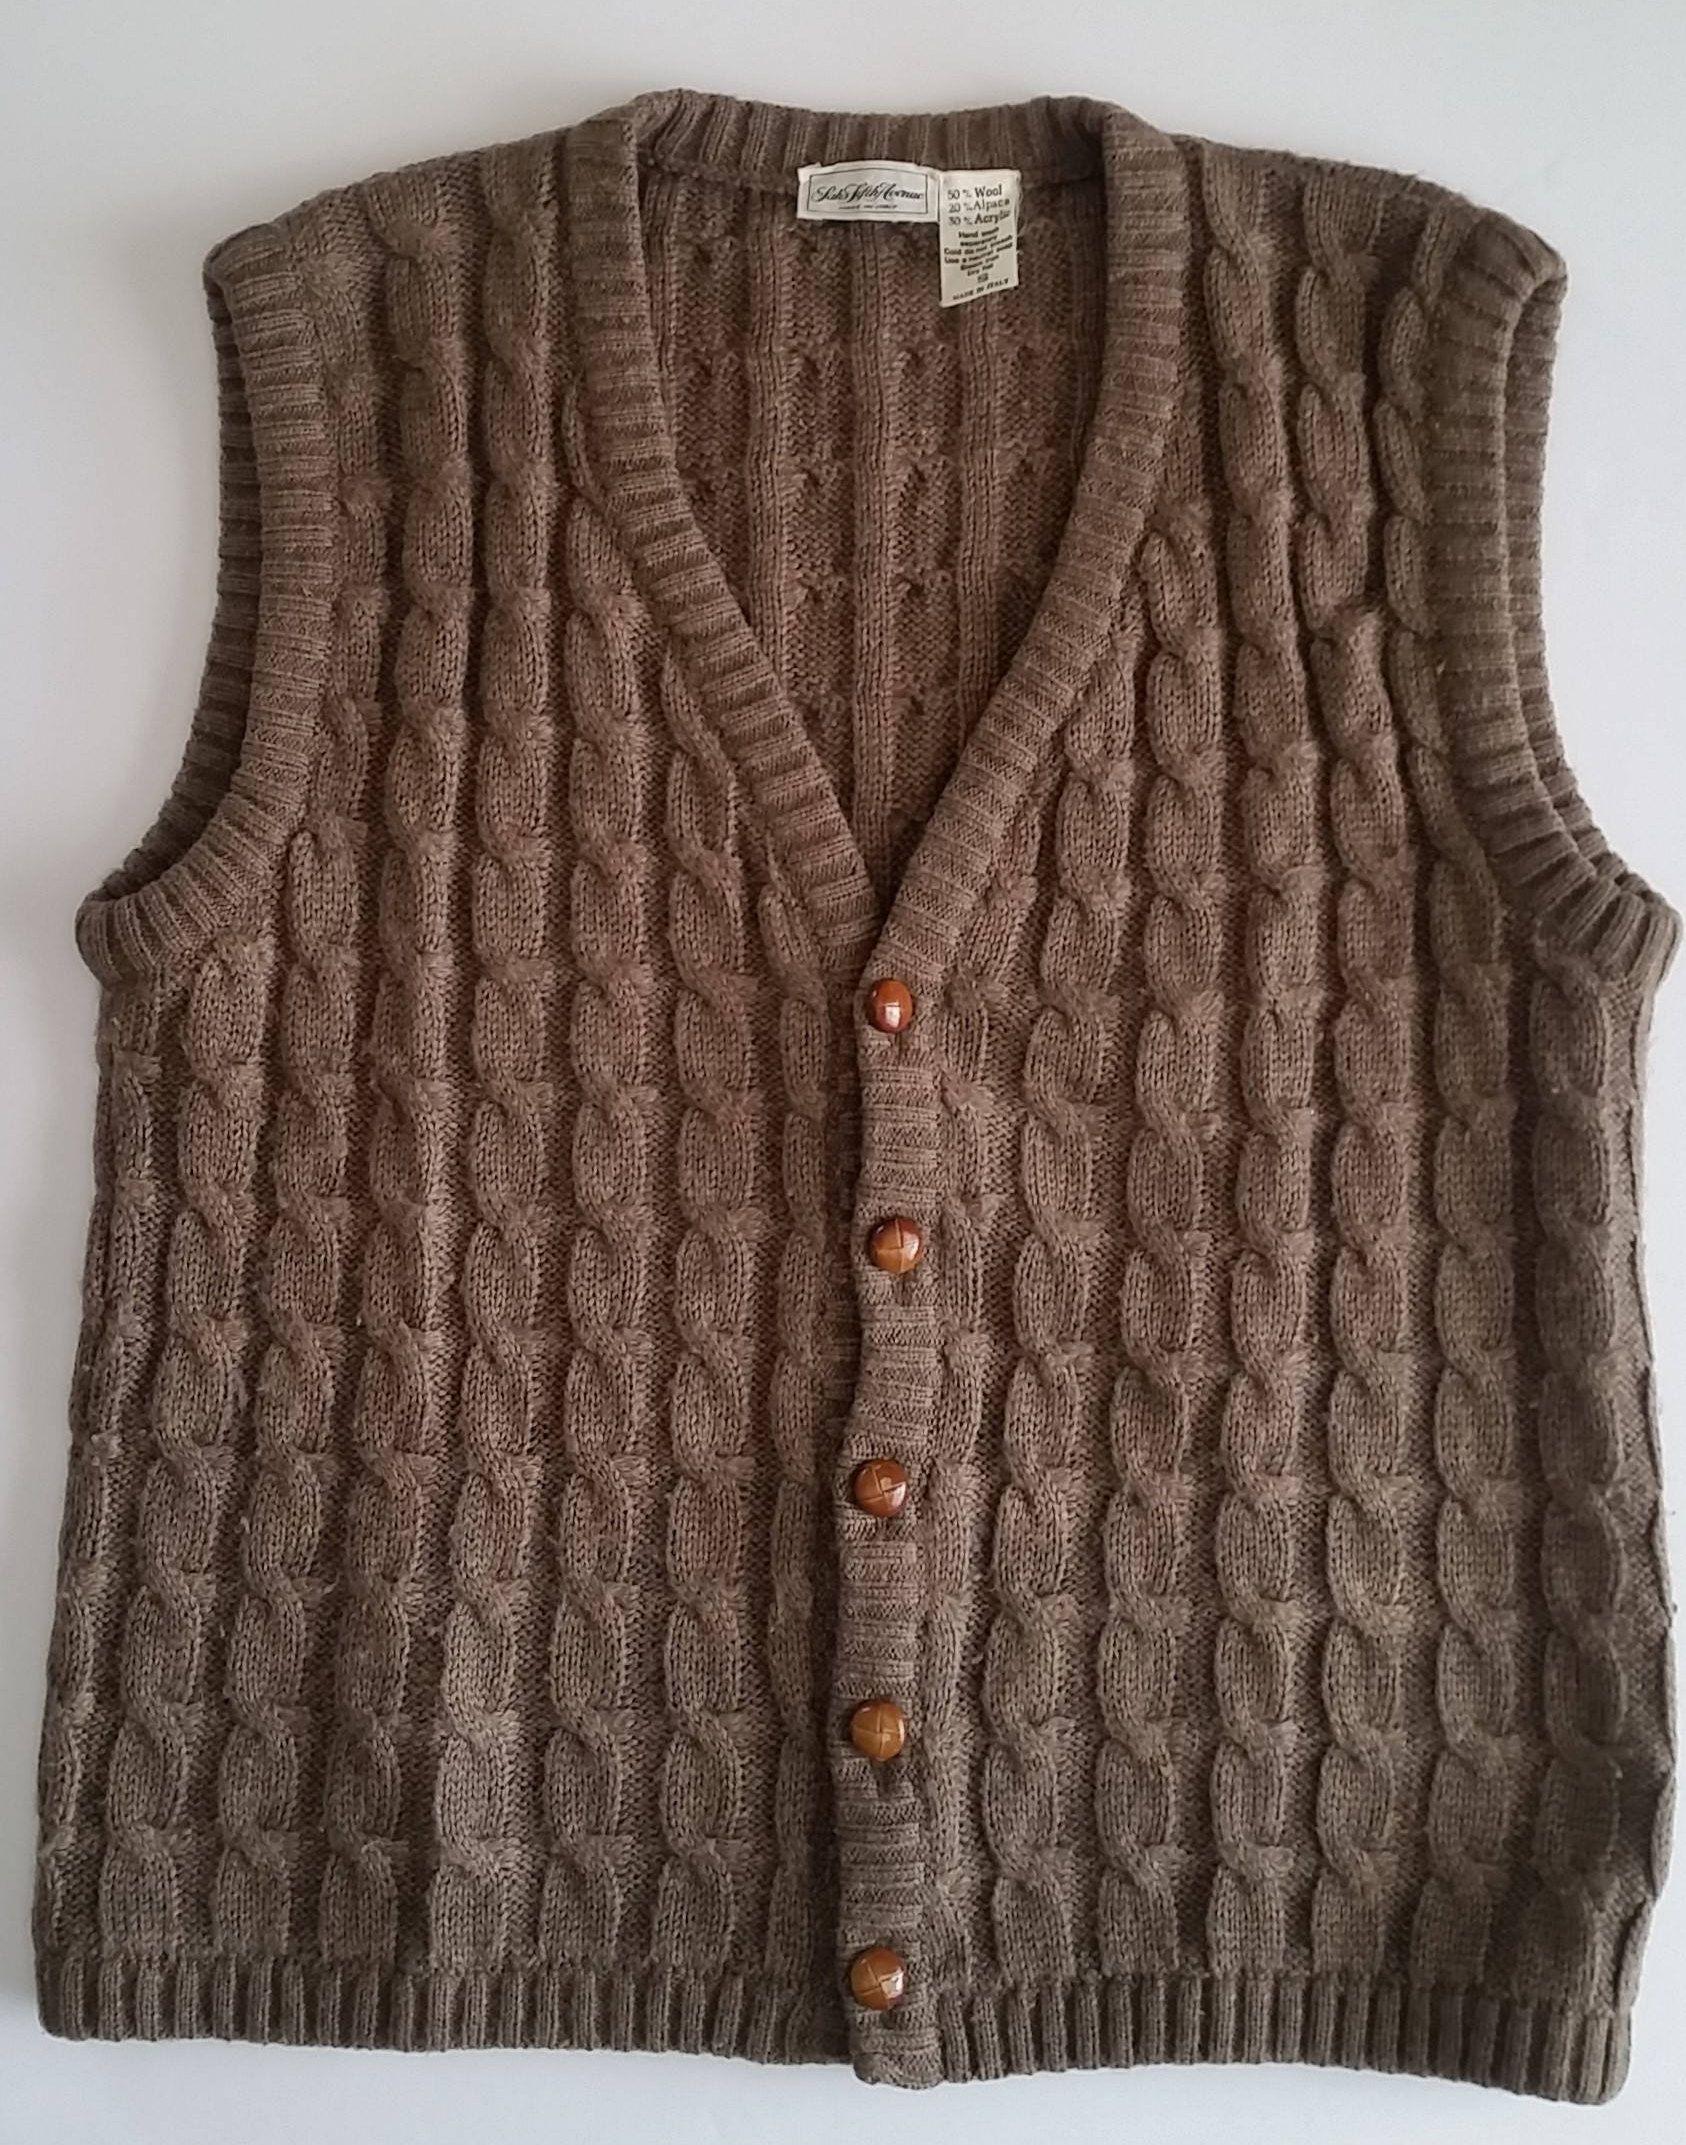 Men's Sweater Vest Wool Alpaca Blend Men's Small SAKS FIFTH AVENUE ...